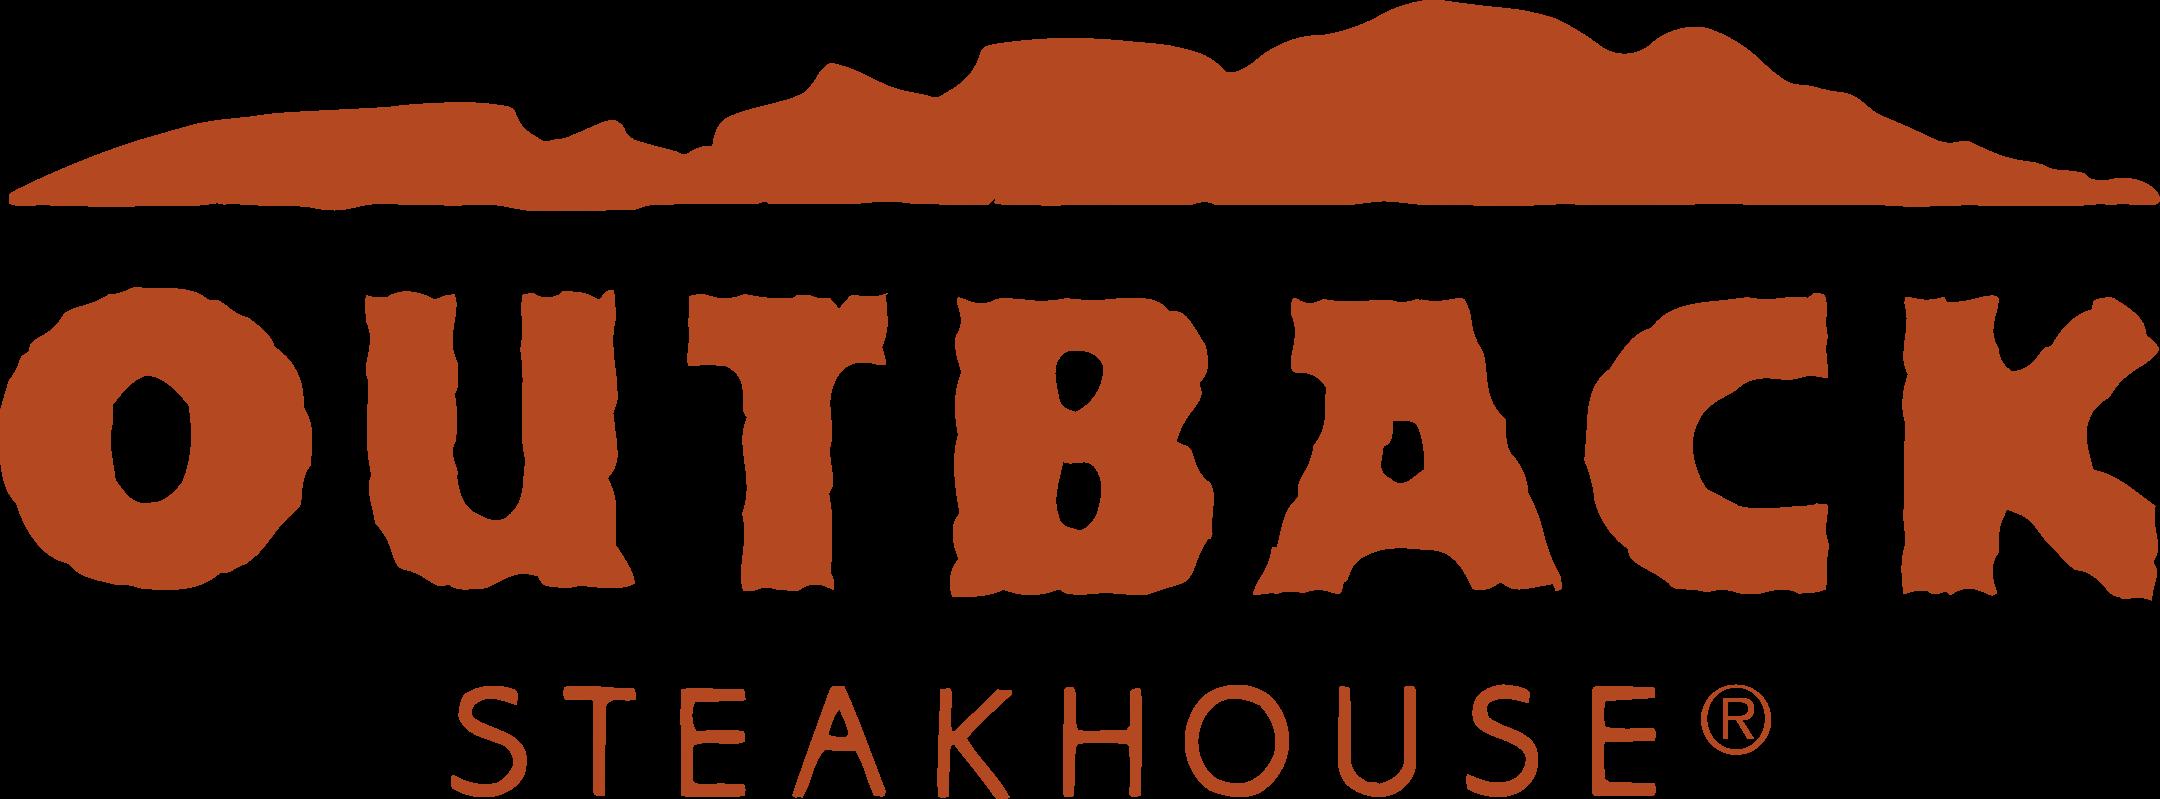 outback logo 1 1 - Outback Steakhouse Logo